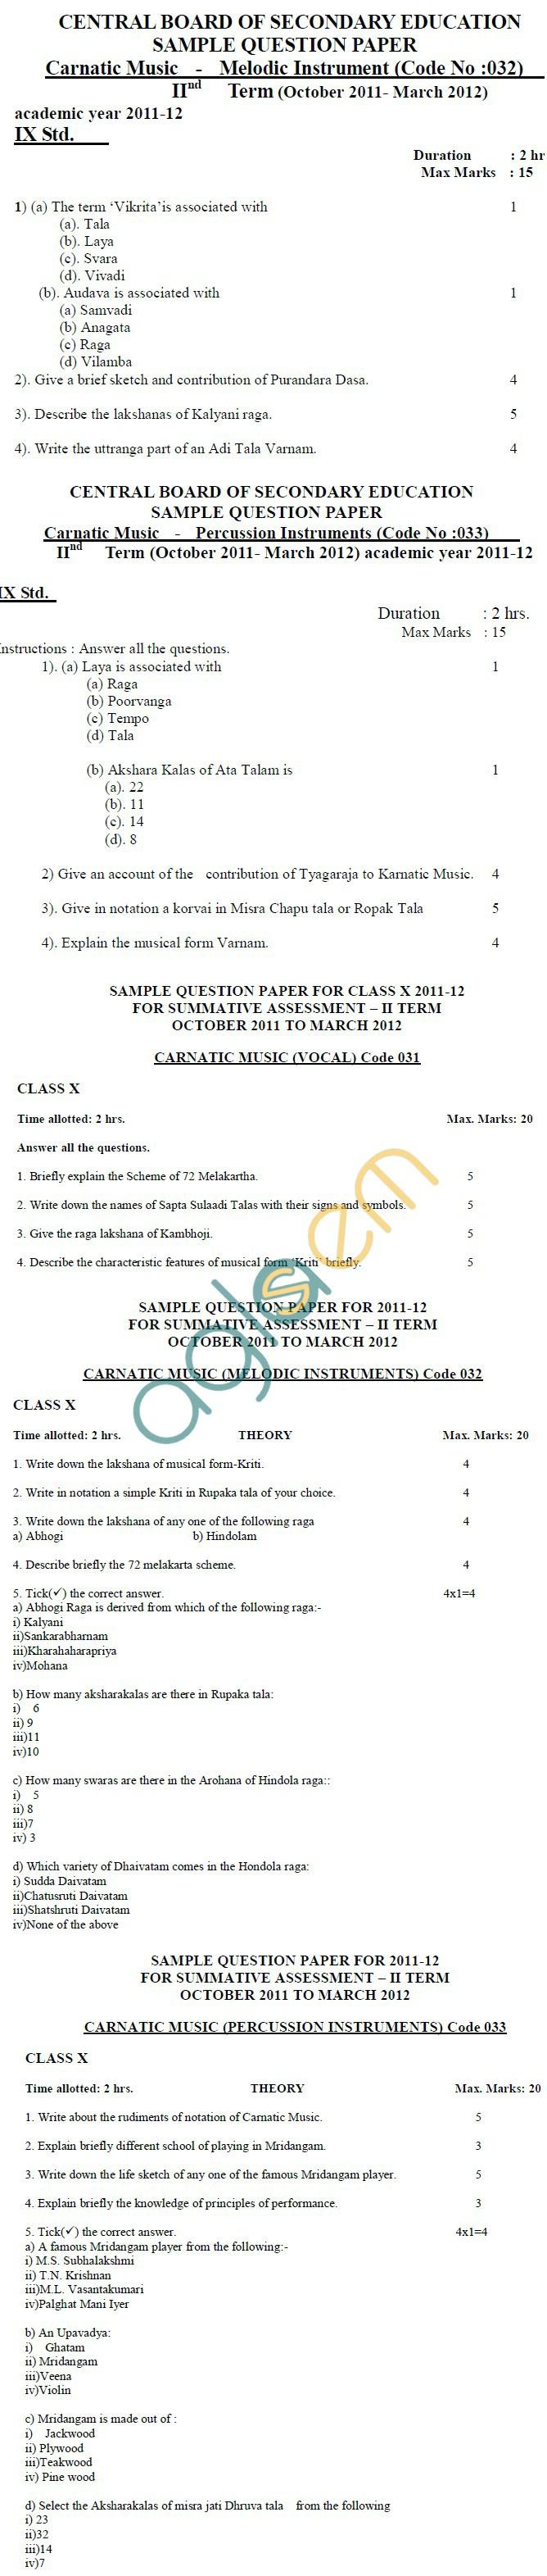 CBSE Class IX & X Sample Papers 2014 (Second Term) Carnatic Music